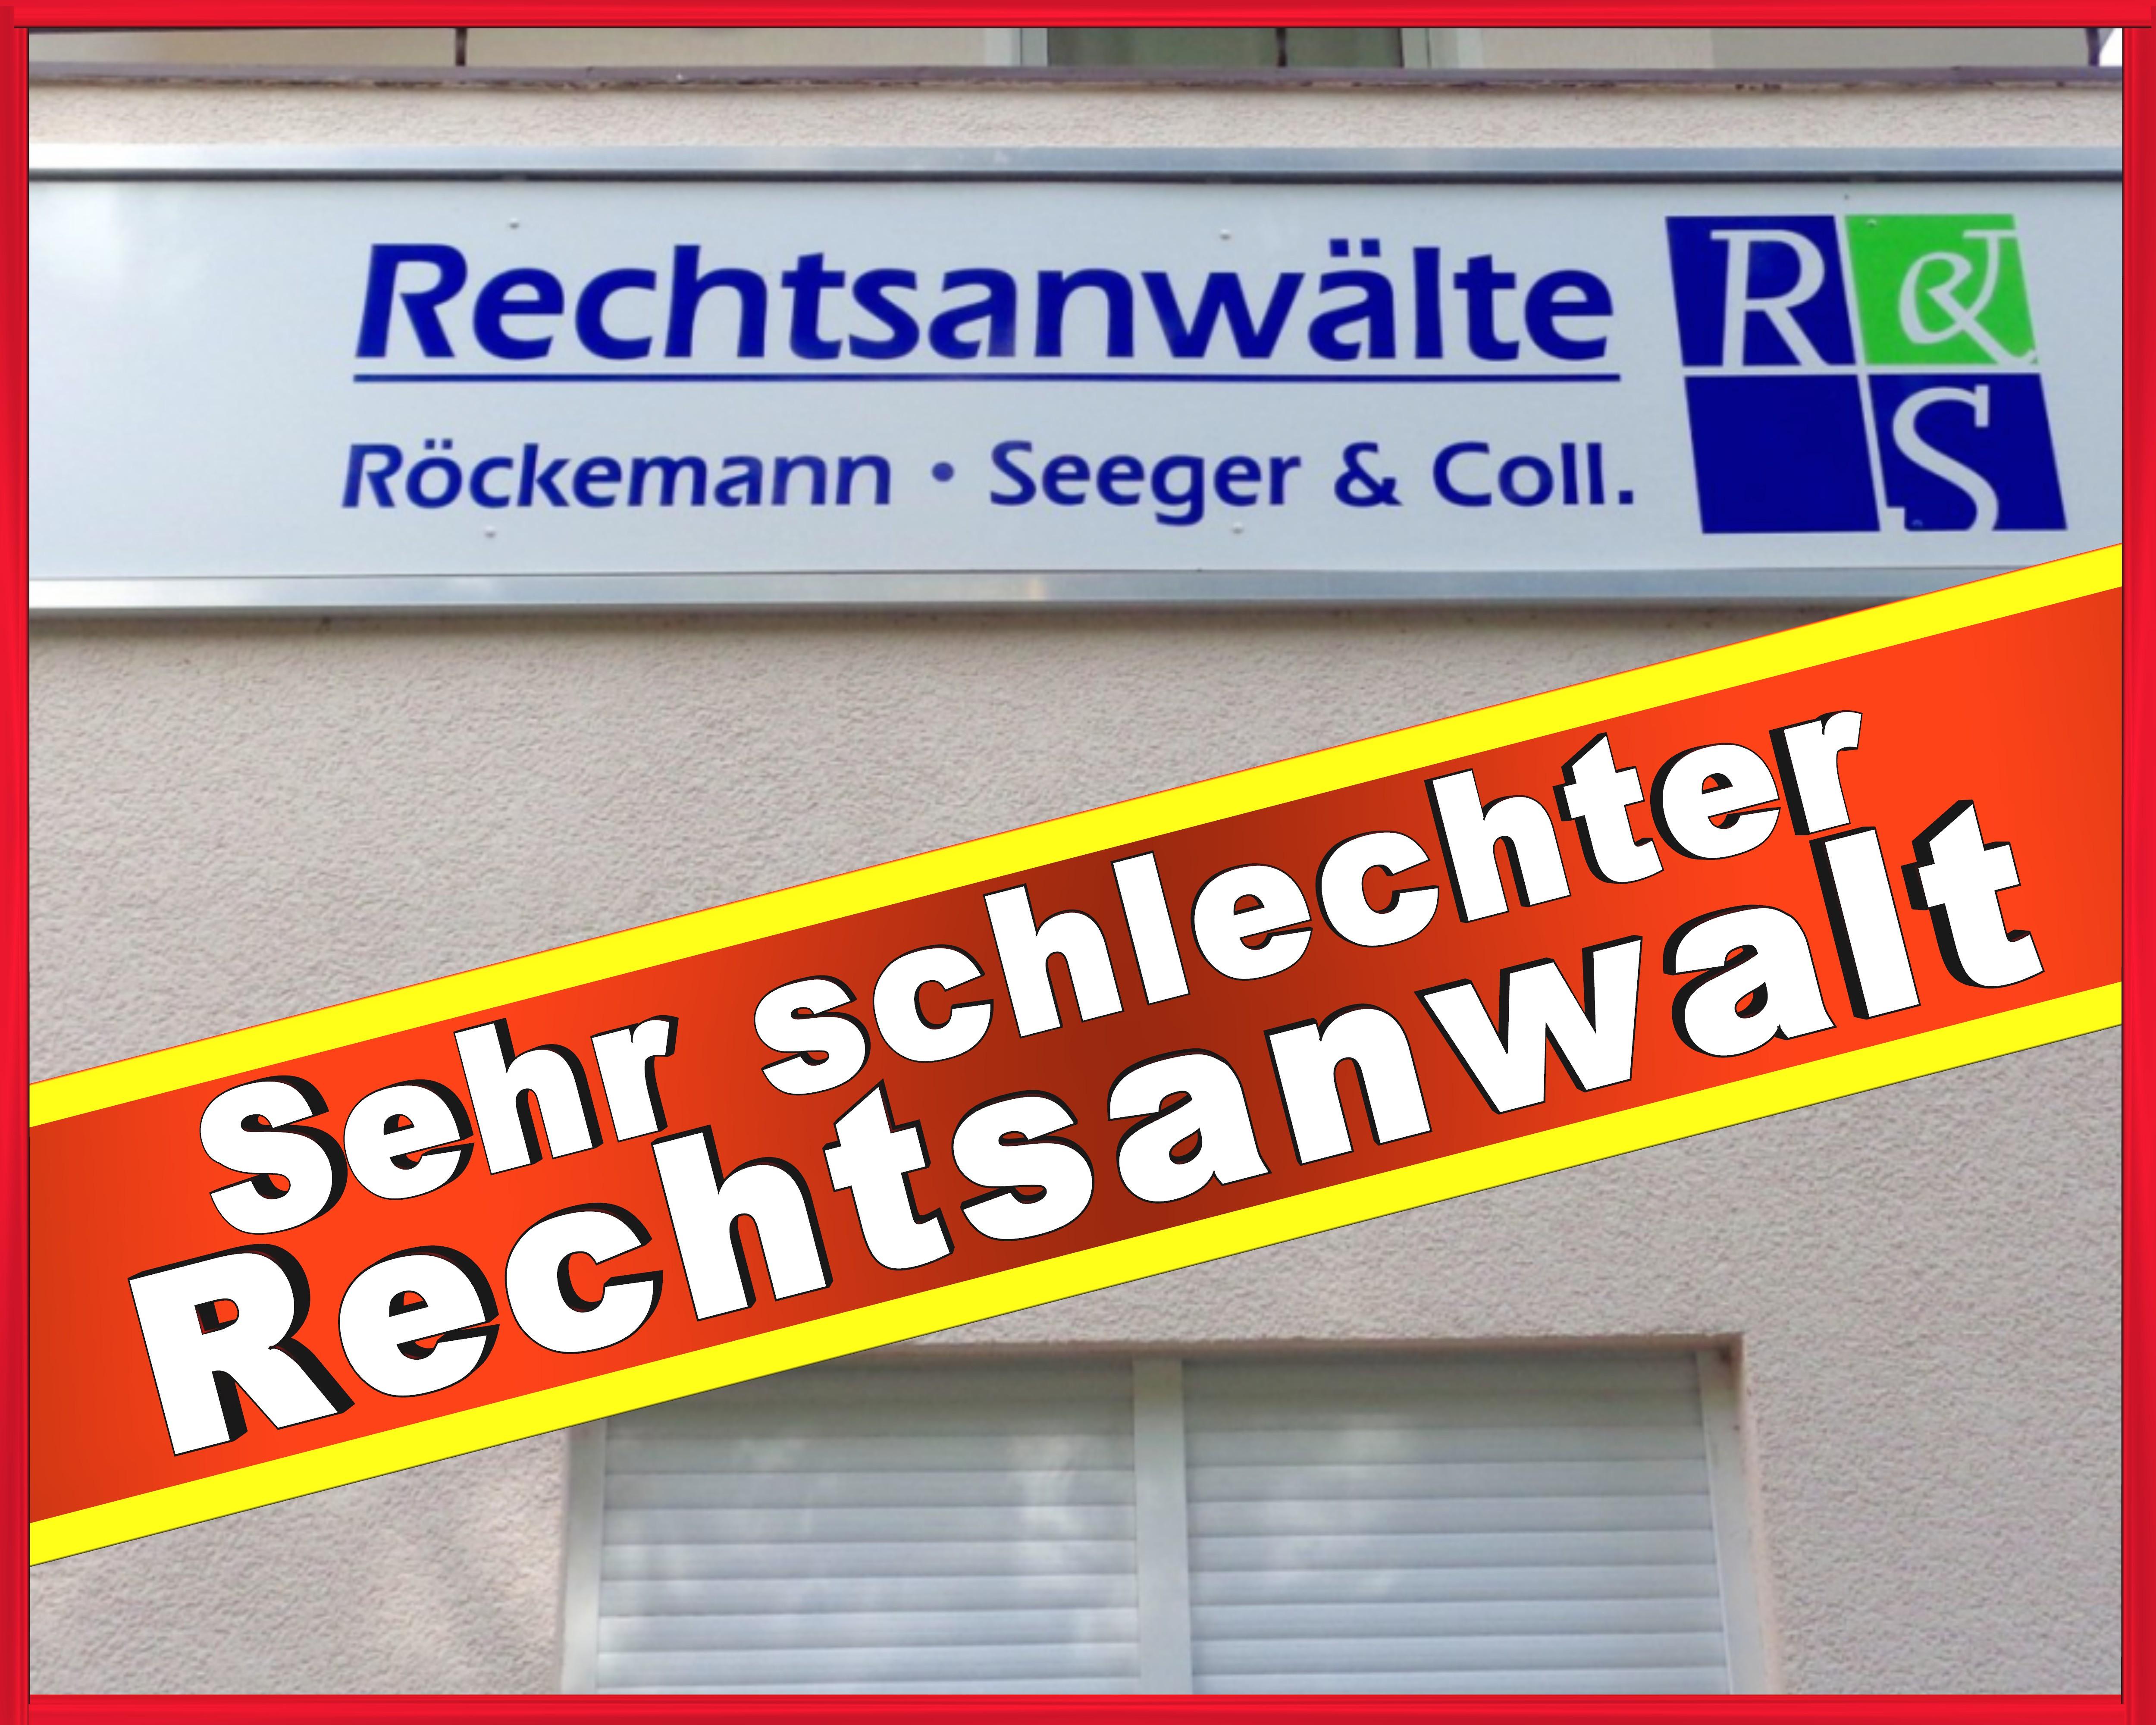 RECHTSANWALT THOMAS RöCKEMANN AFD MINDEN (3)